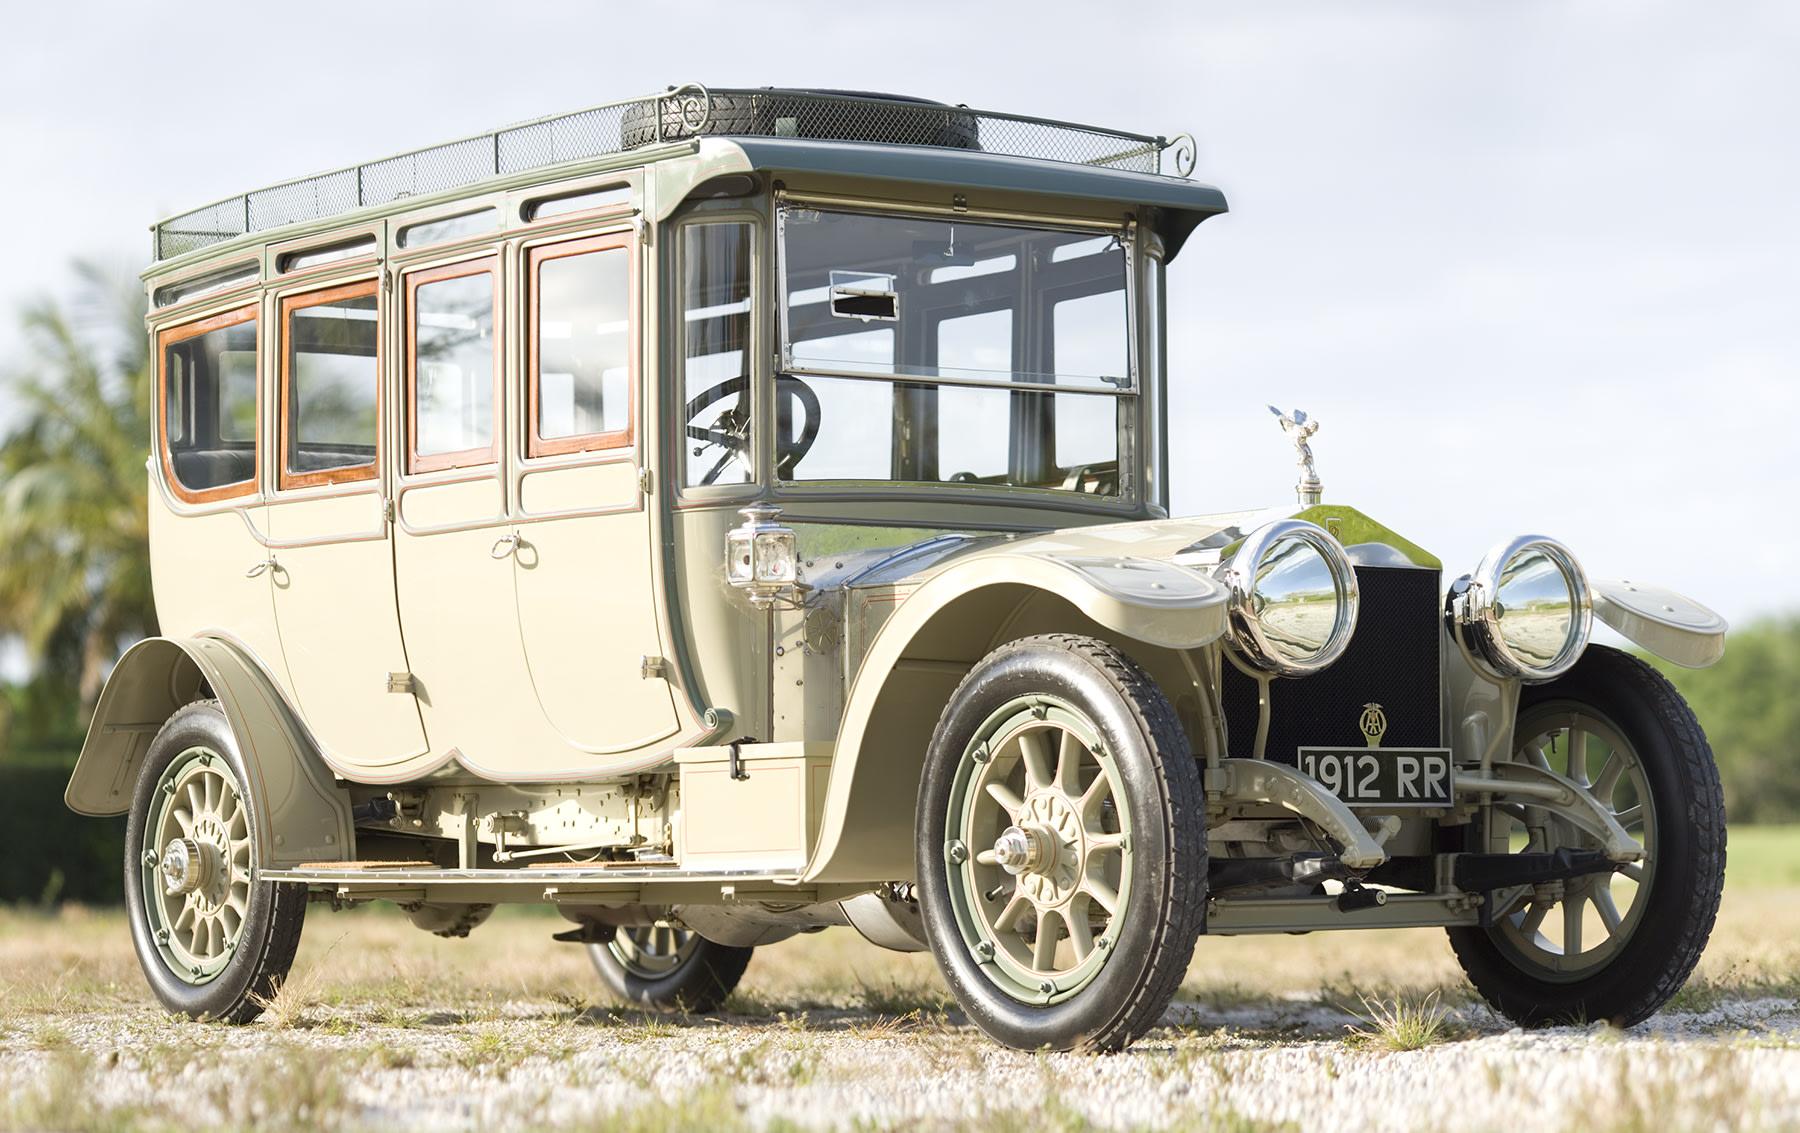 1912 Rolls-Royce 40/50 HP Silver Ghost Double Pullman Limousine